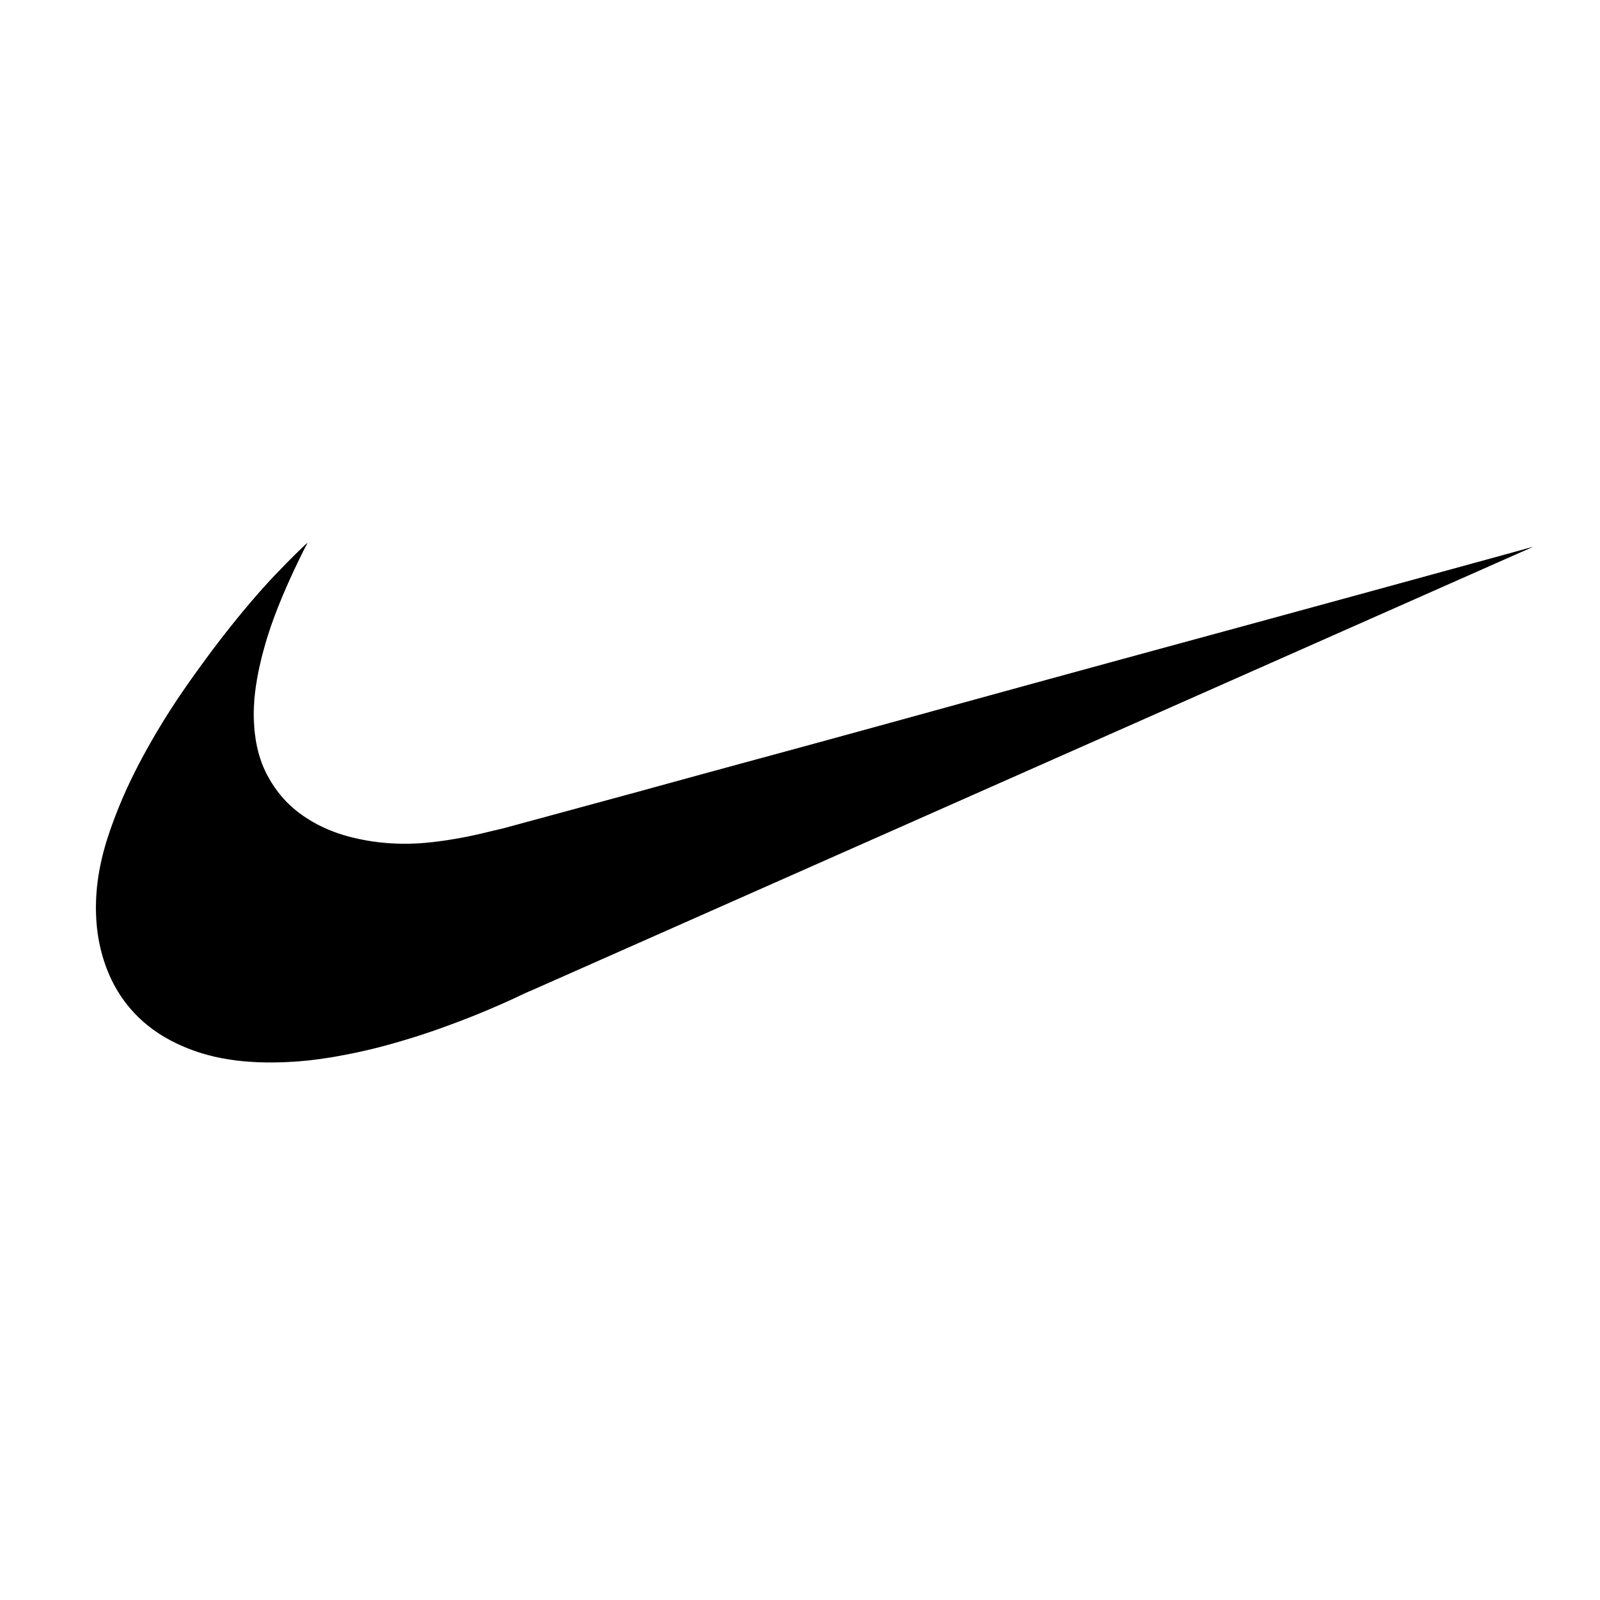 nike_swoosh_logo_black